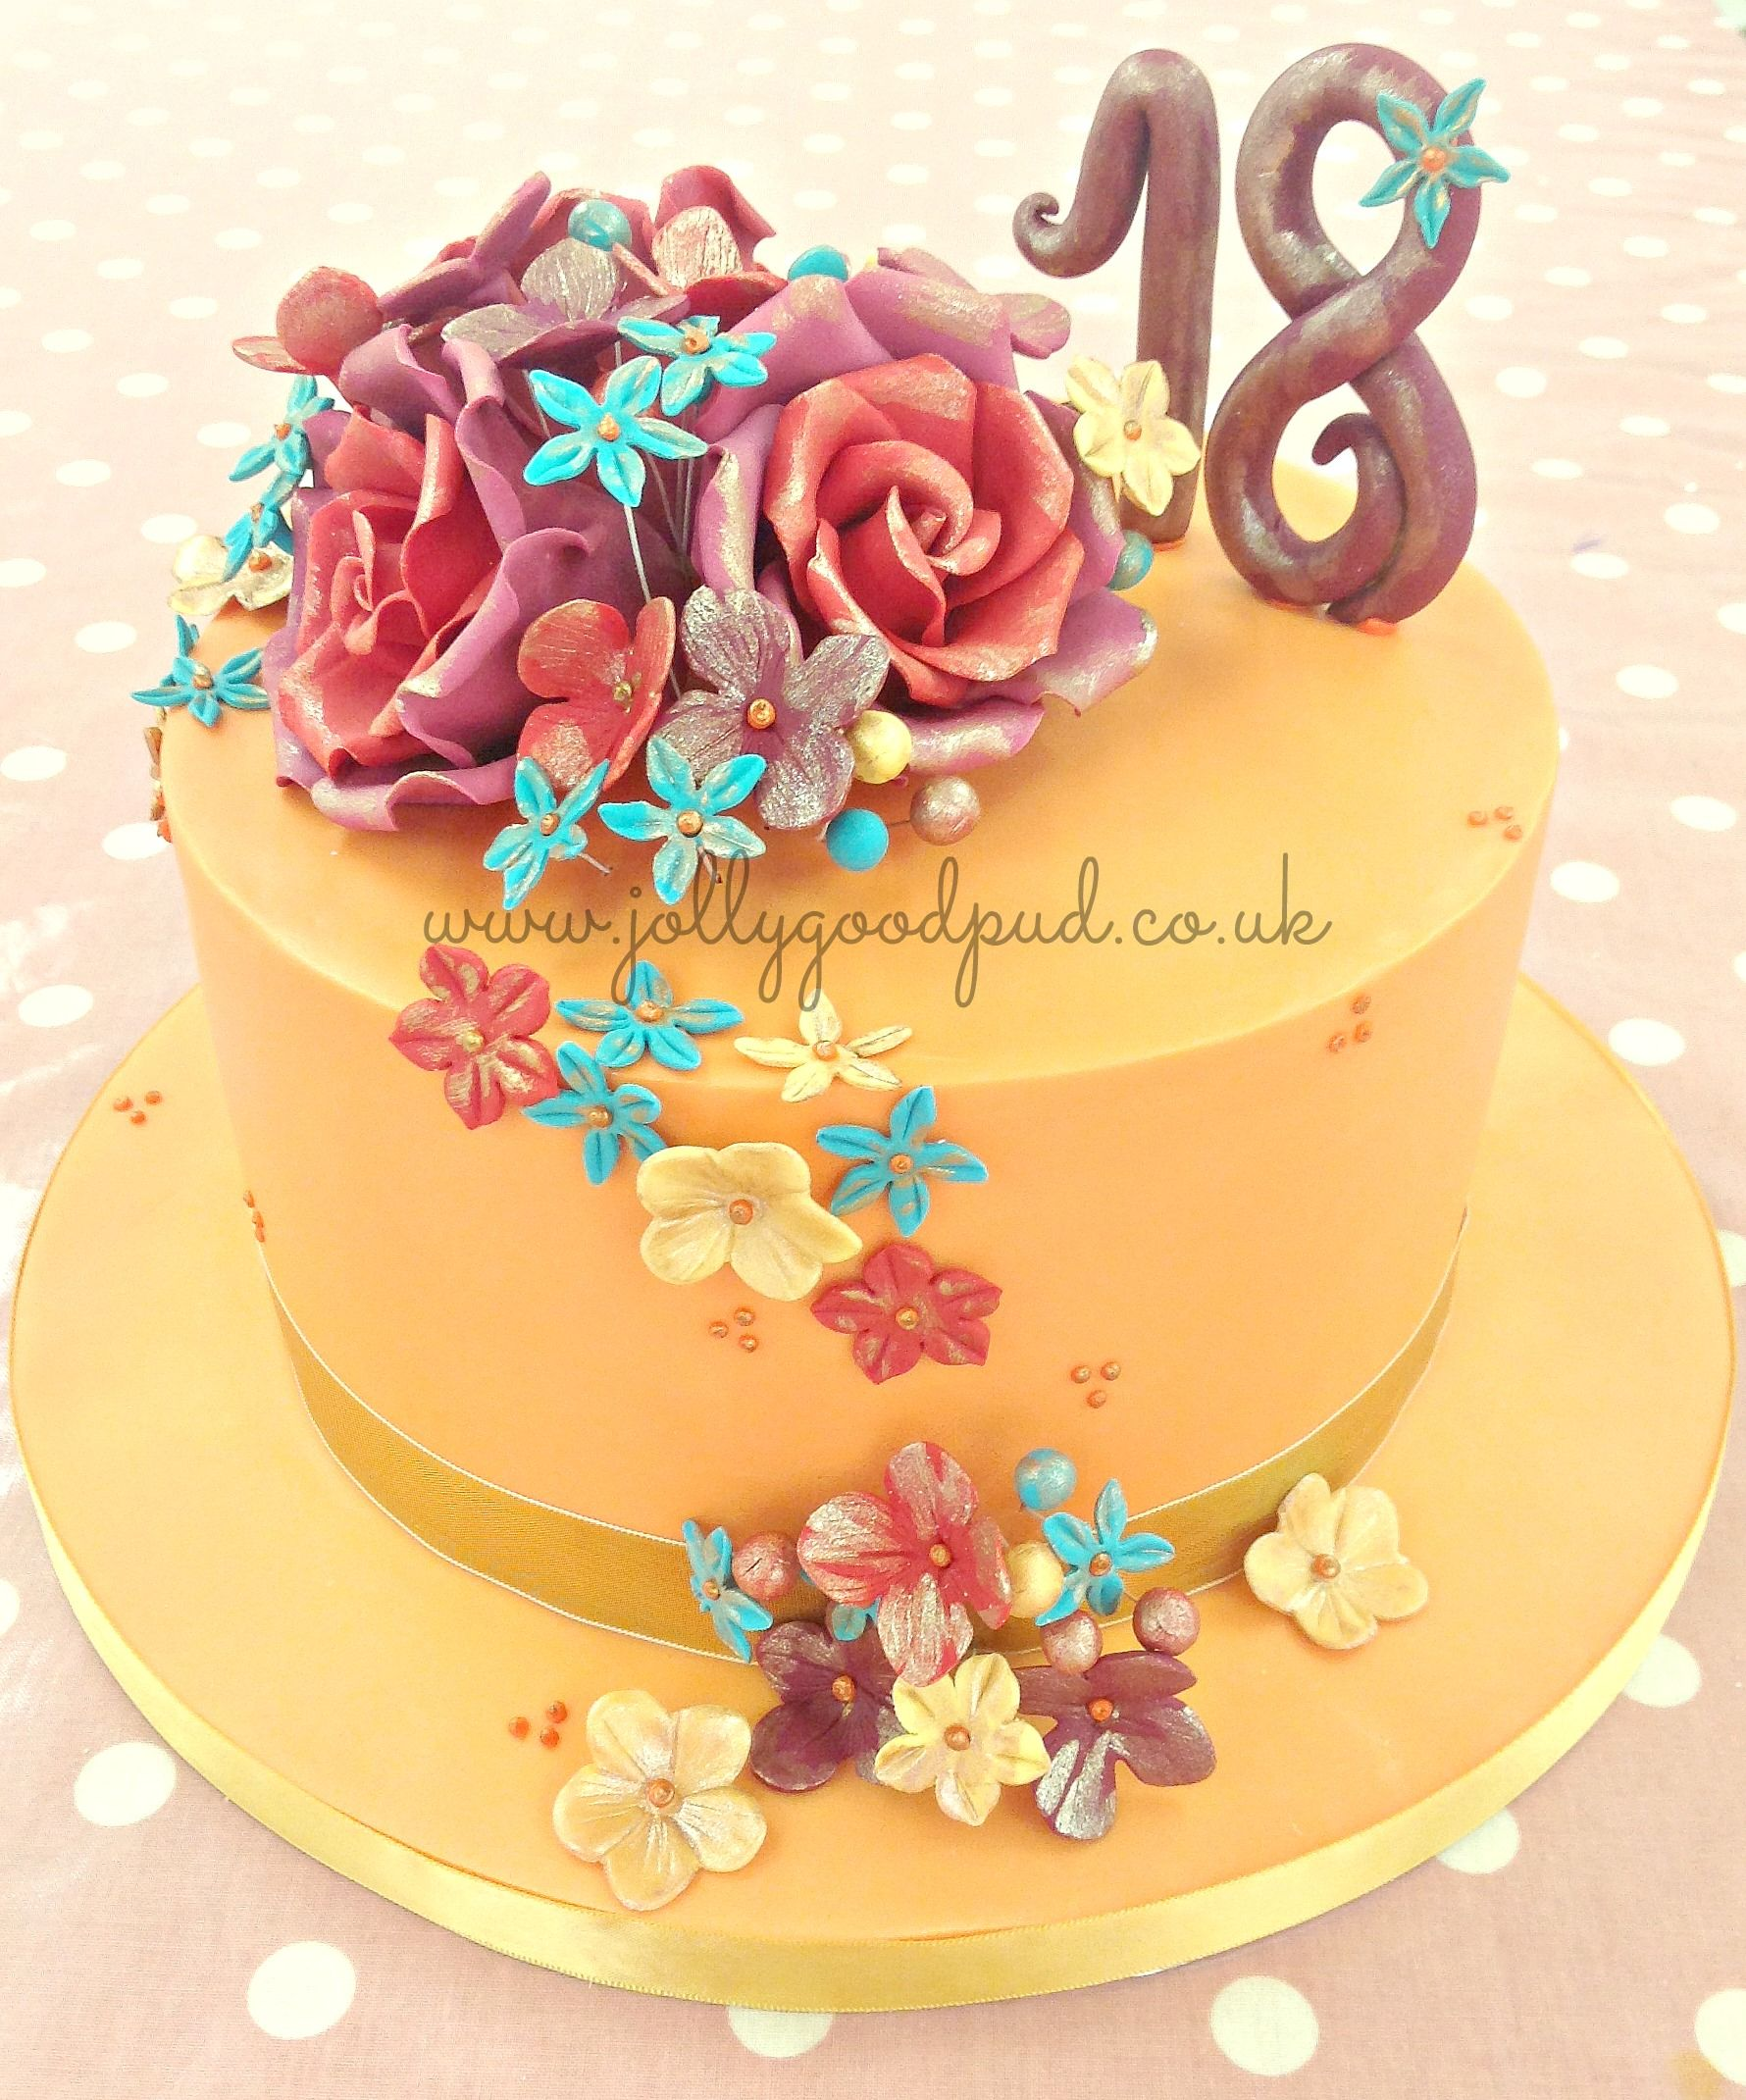 18th birthday cake wwwjollygoodpudcouk 18th cake